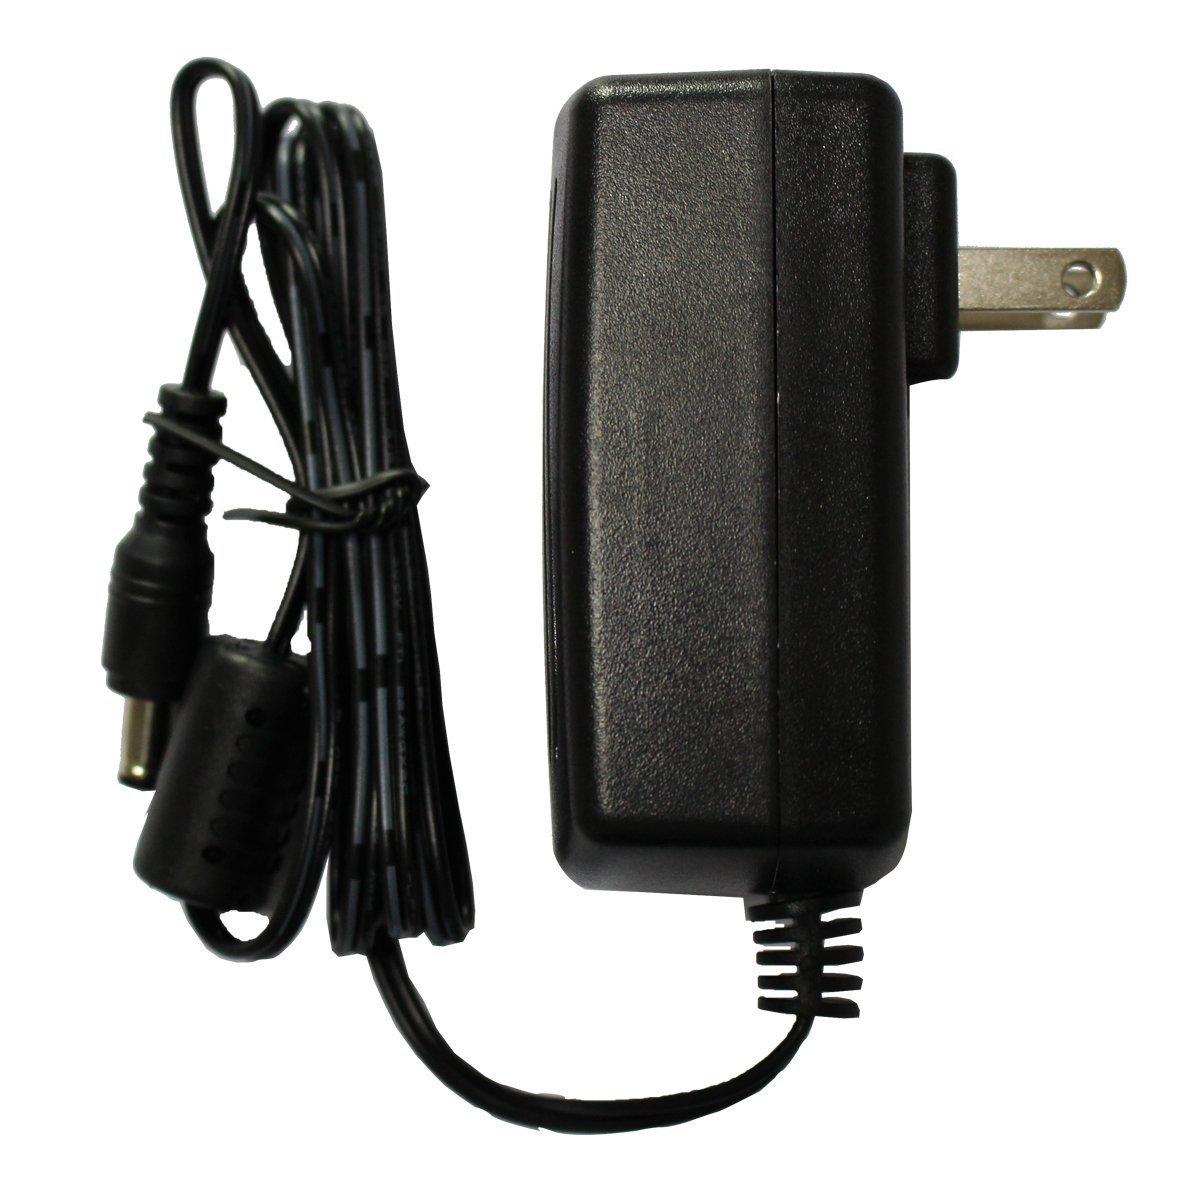 Power Supply Adapter CS-1203000 AC 100-240V to DC 12V 3A 12V3A Power Plug 120cm 4 Foot Cord for YESKAMO NVR DVR, Efficiency VI Level, UL Listed FCC